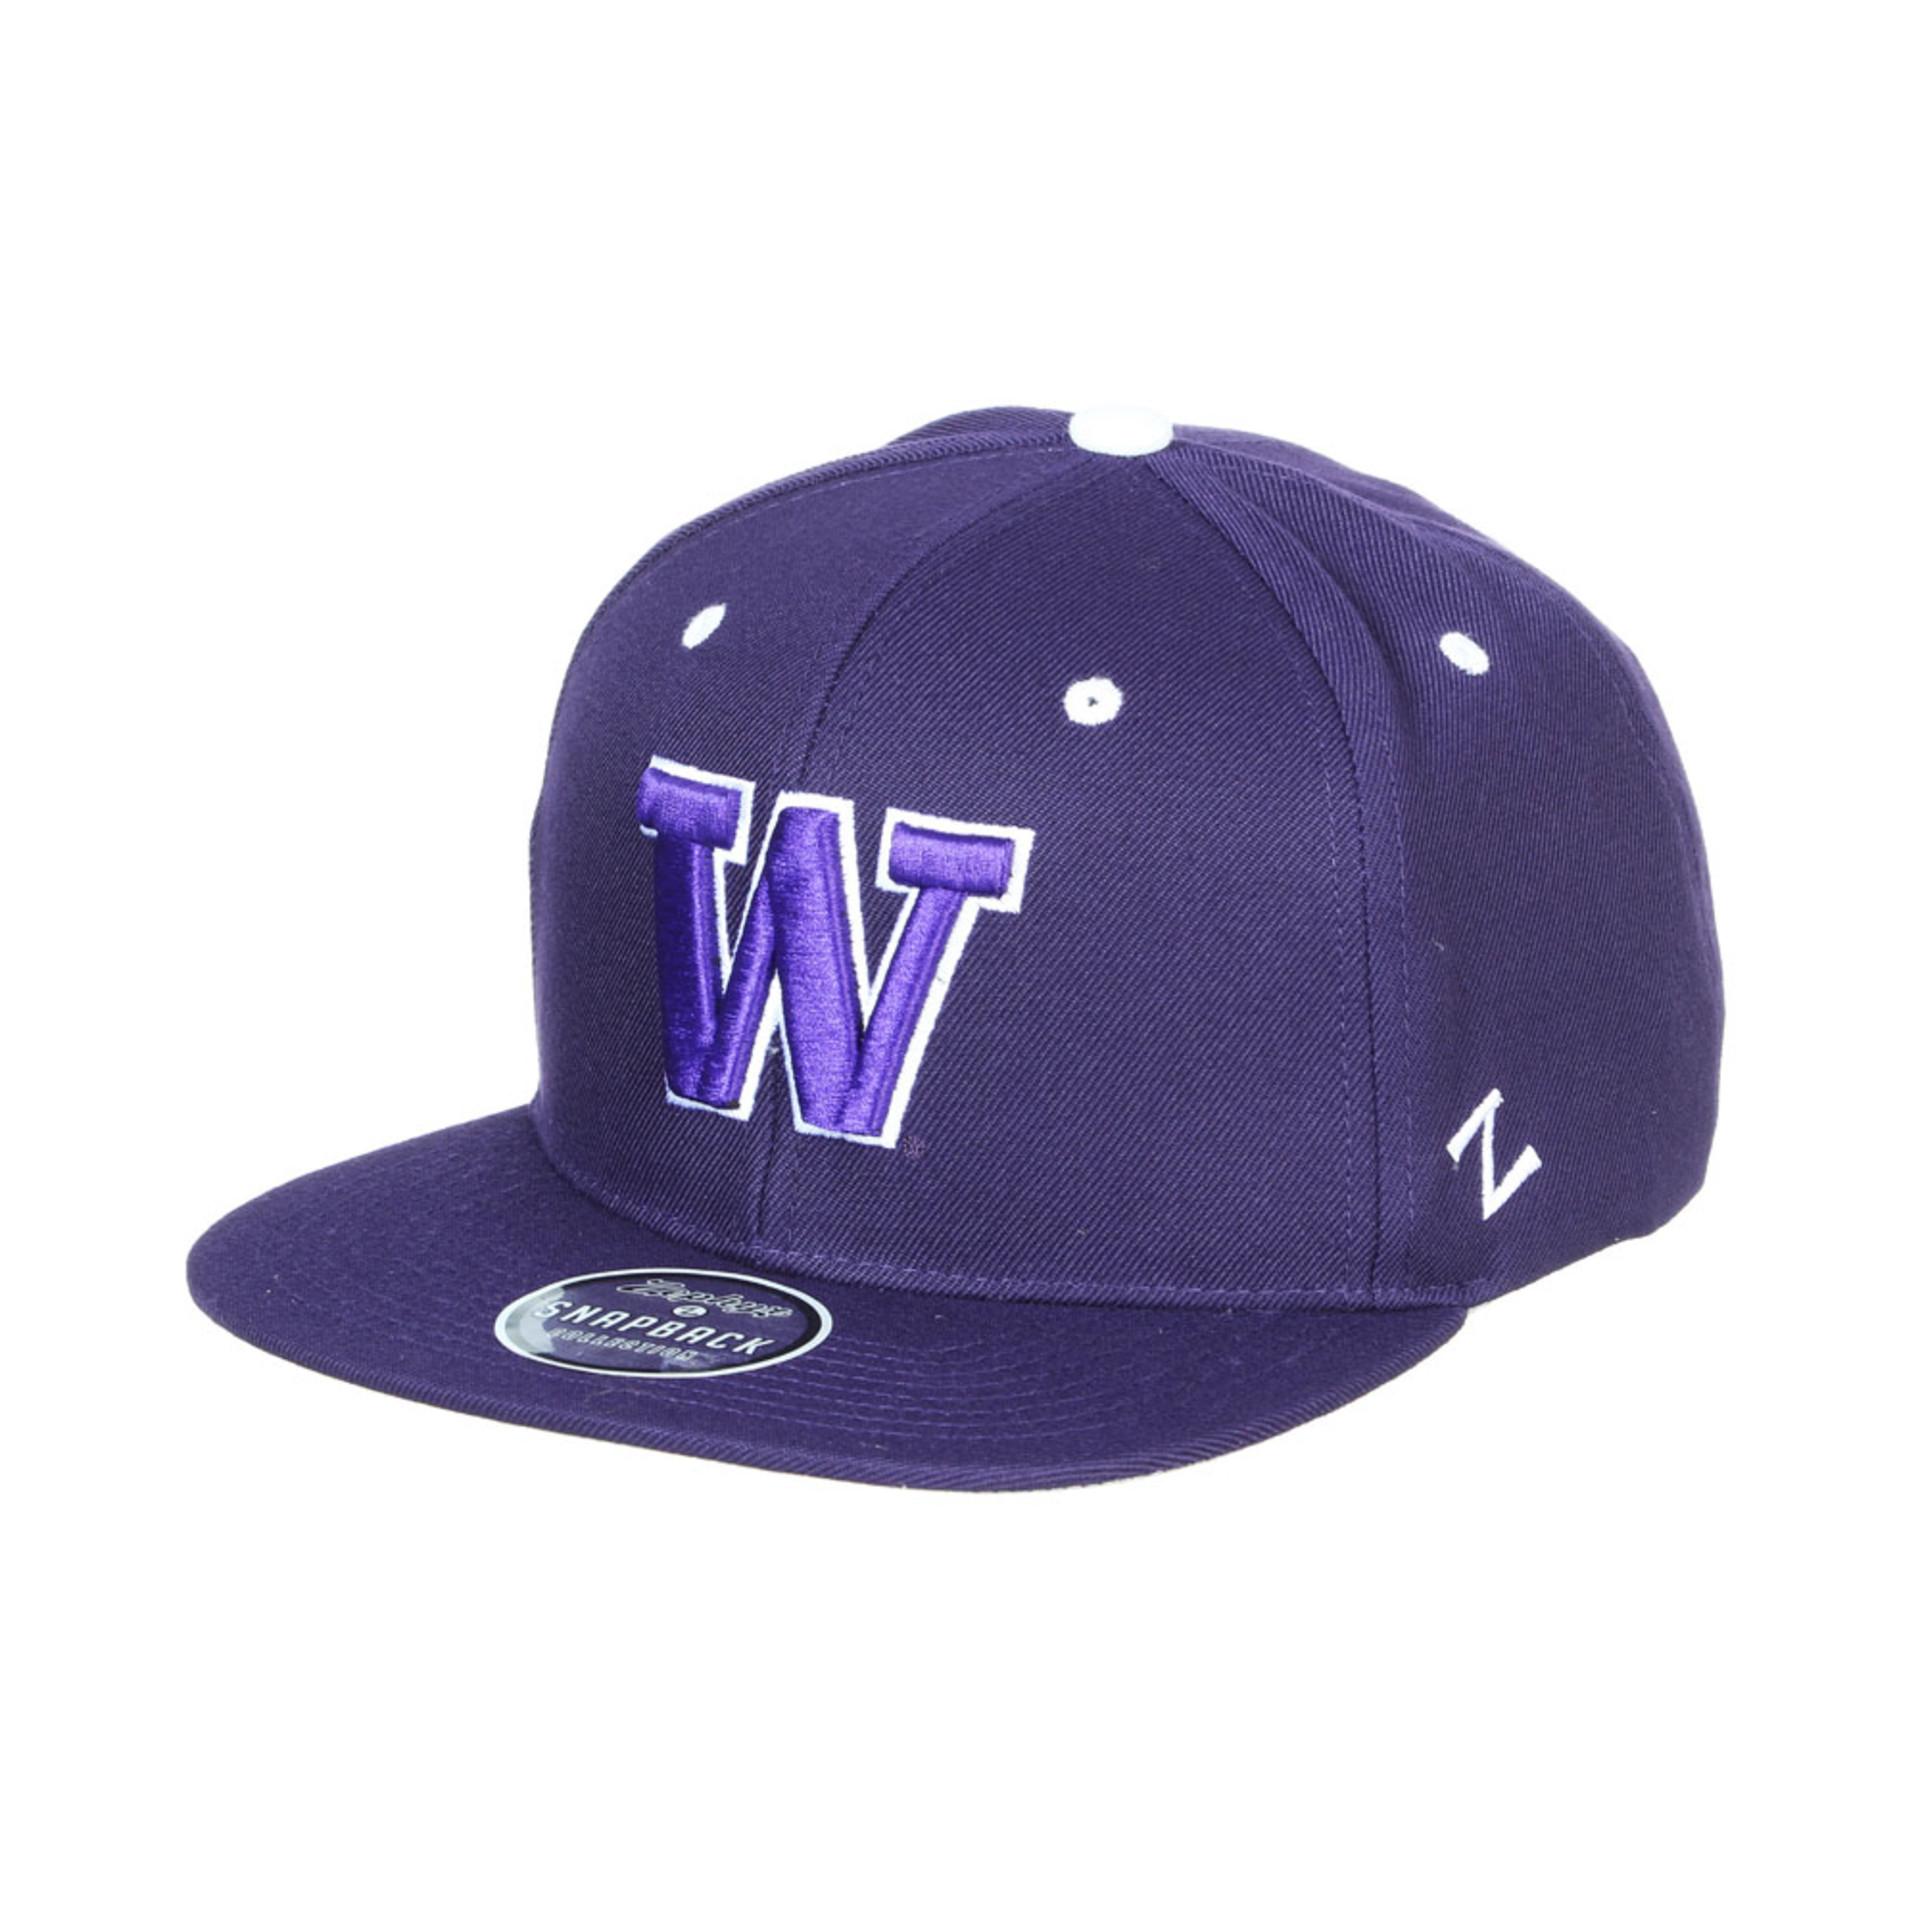 Zephyr Unisex Purple W Z11 Highlight Snapback Hat – Front